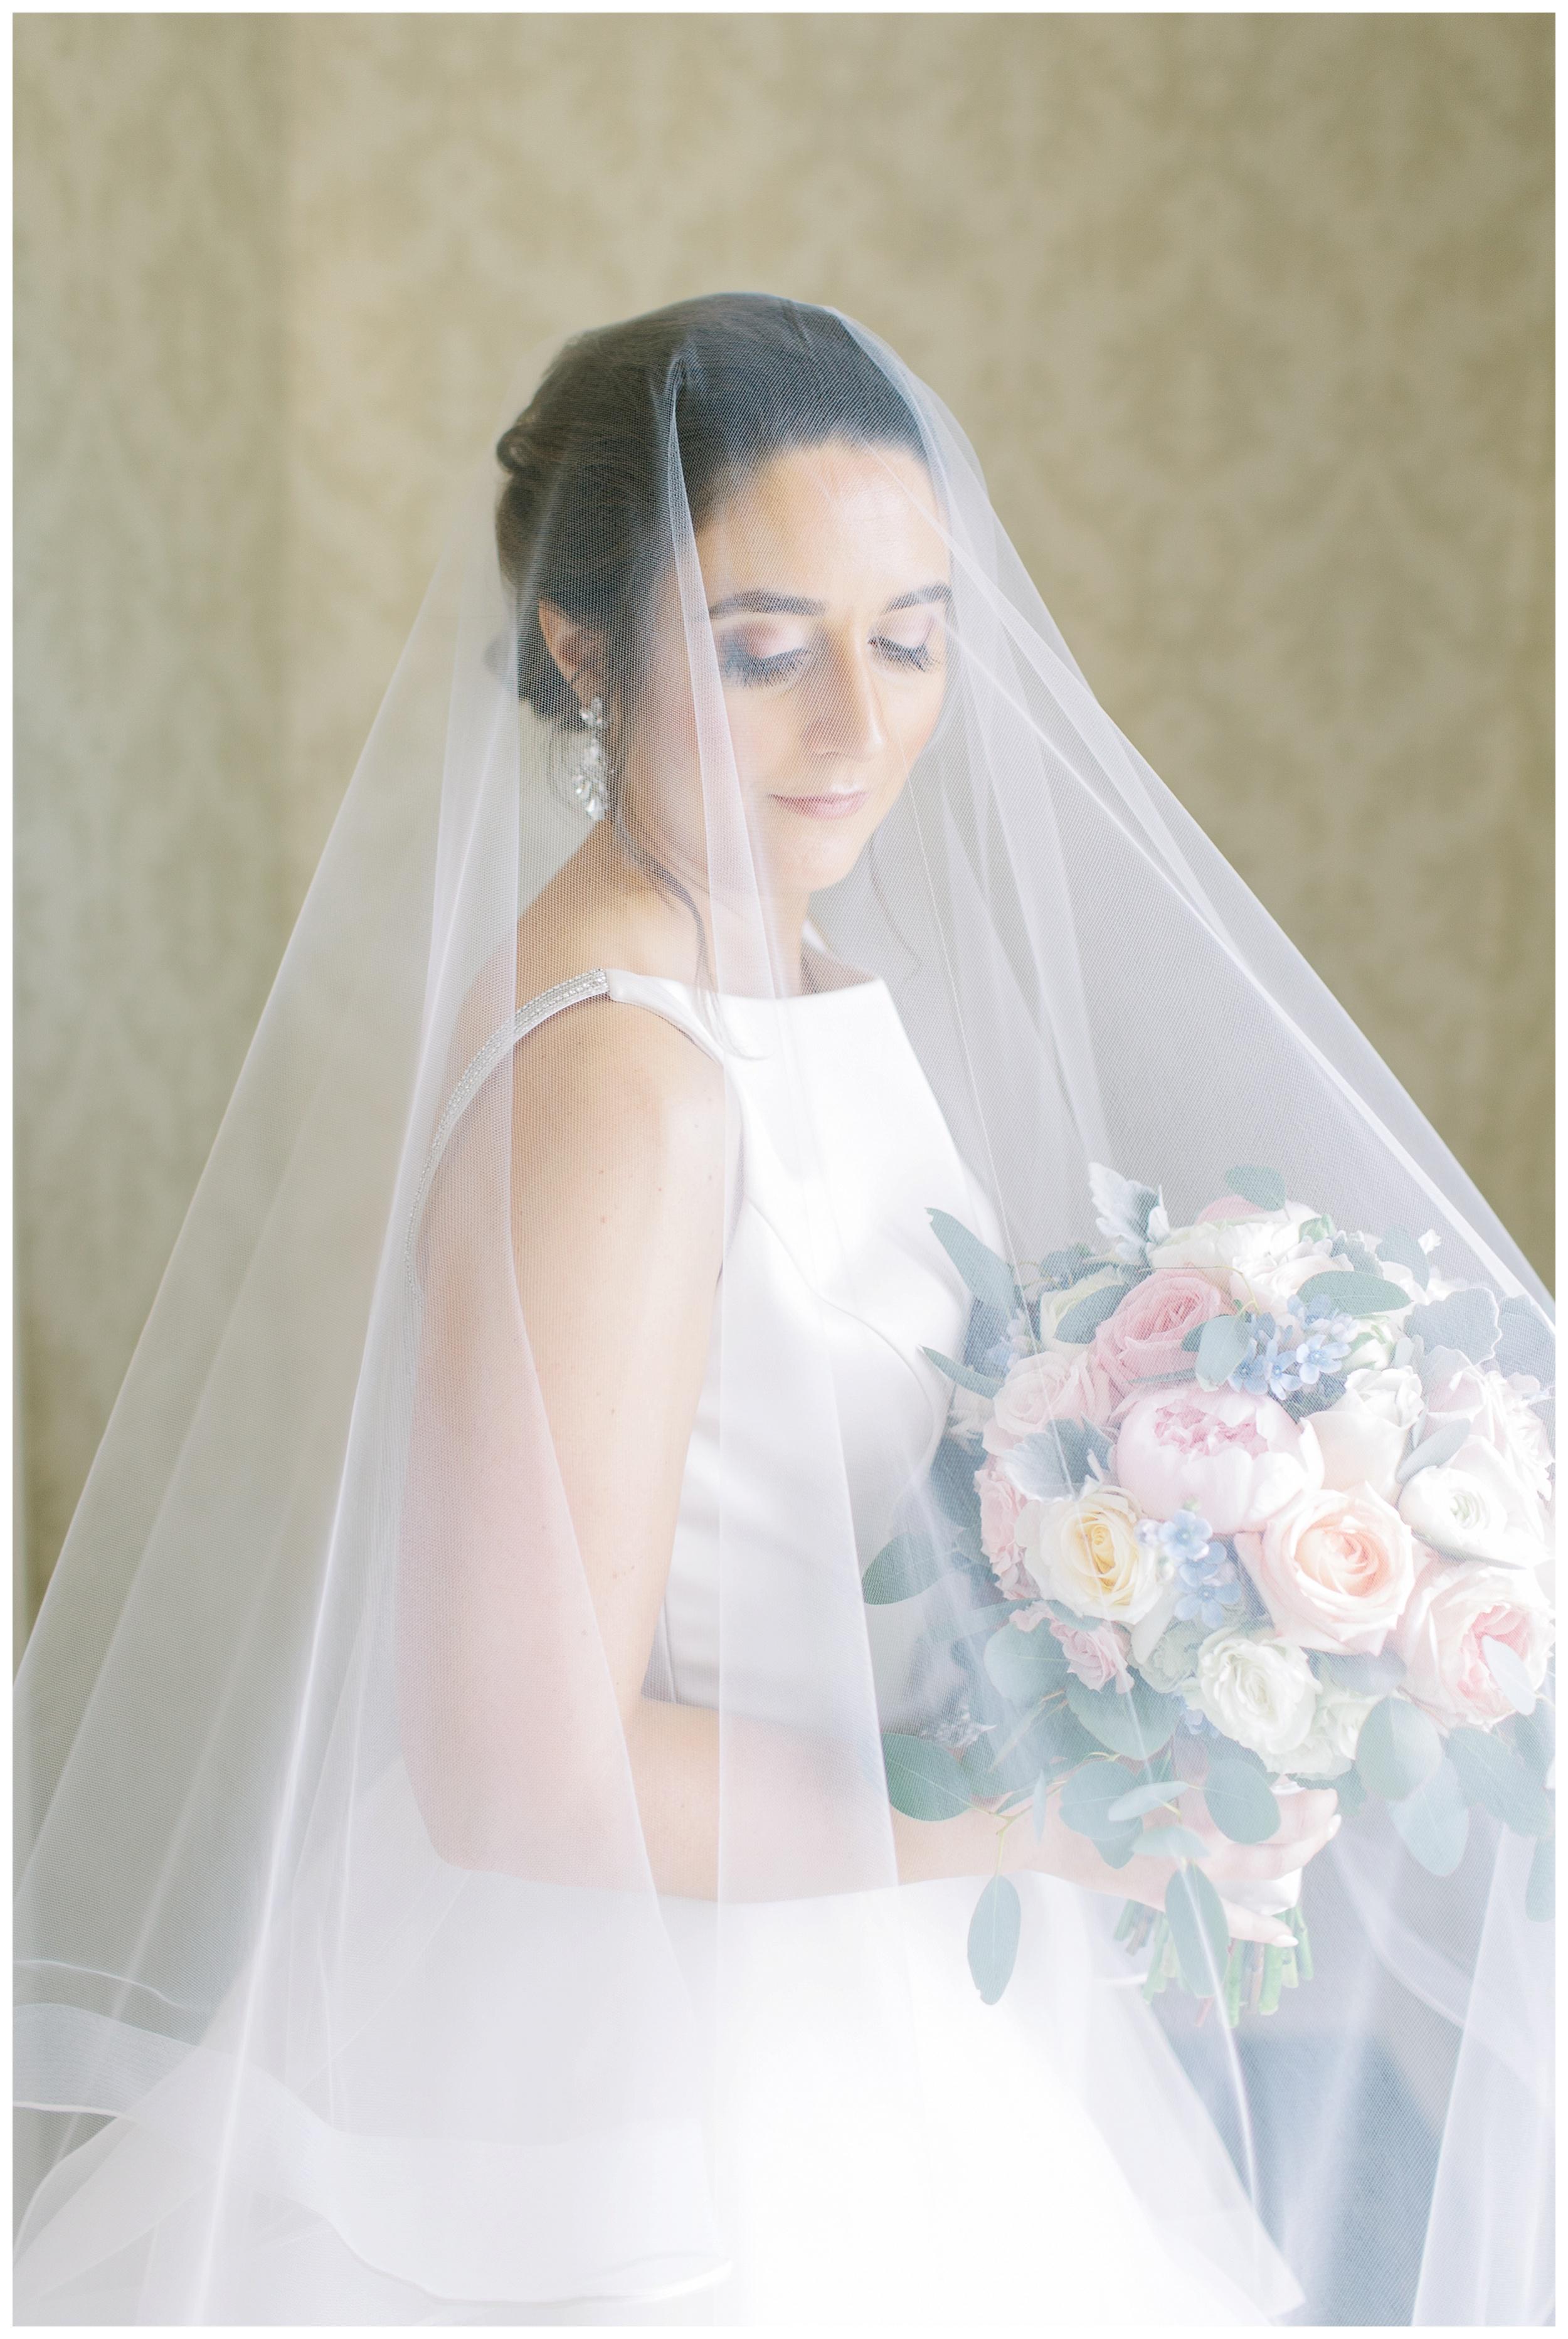 DAR Constitution Hall Wedding Wedding | Daughters of the American Revolution Wedding | District of Columbia Film Wedding Photographer Kir Tuben_0019.jpg